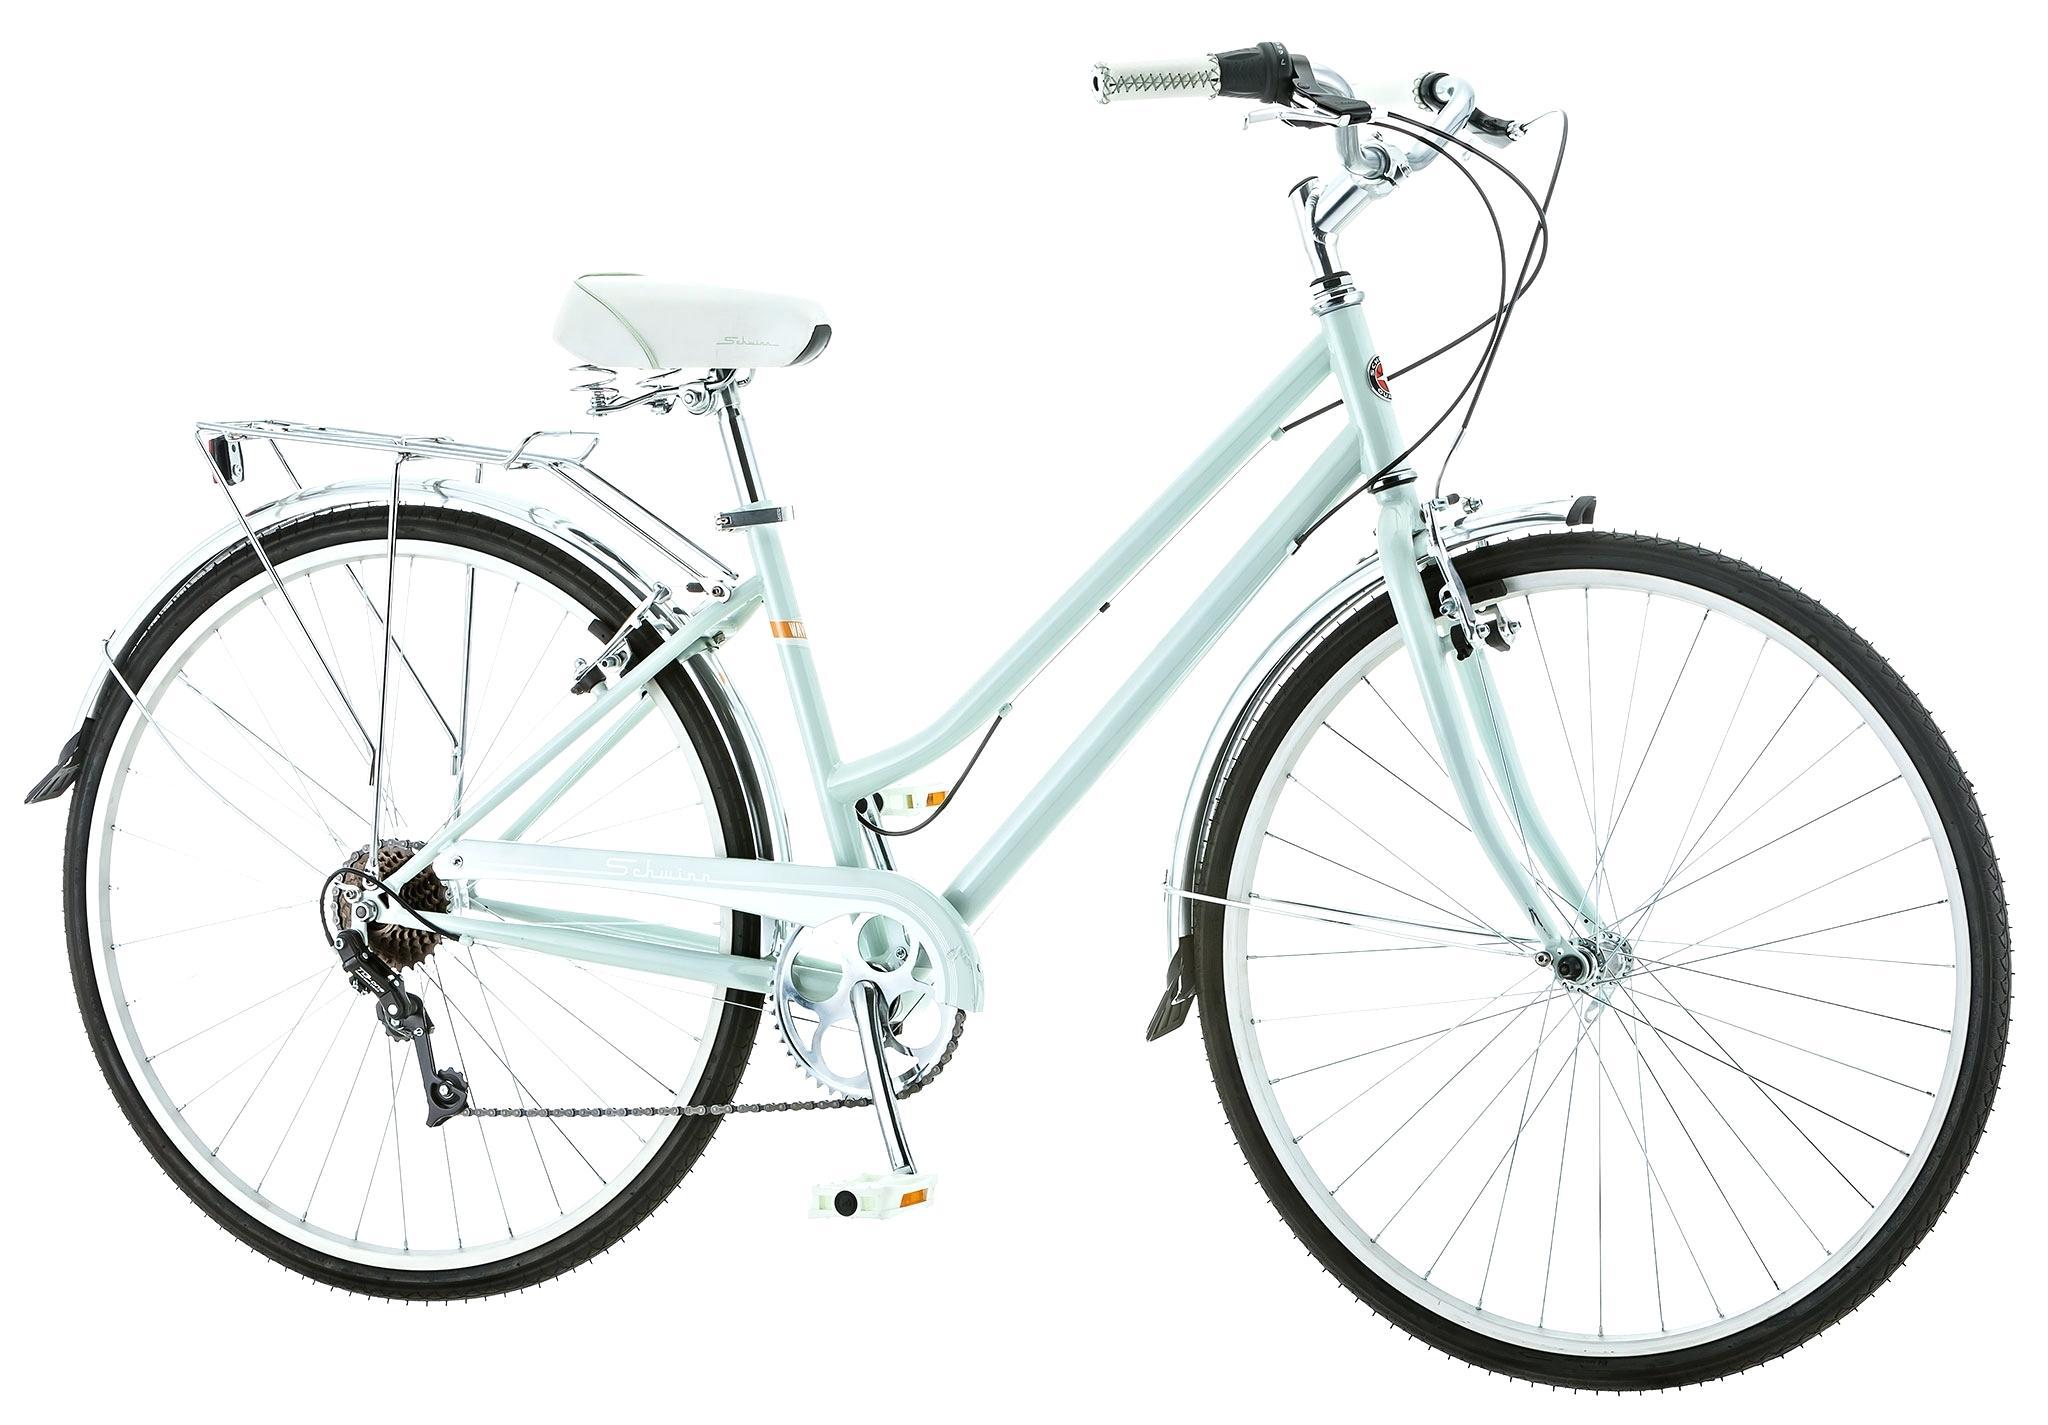 2048x1425 Retro Tandem Bike Retro Schwinn Tandem Bike Barker Cycles Glory